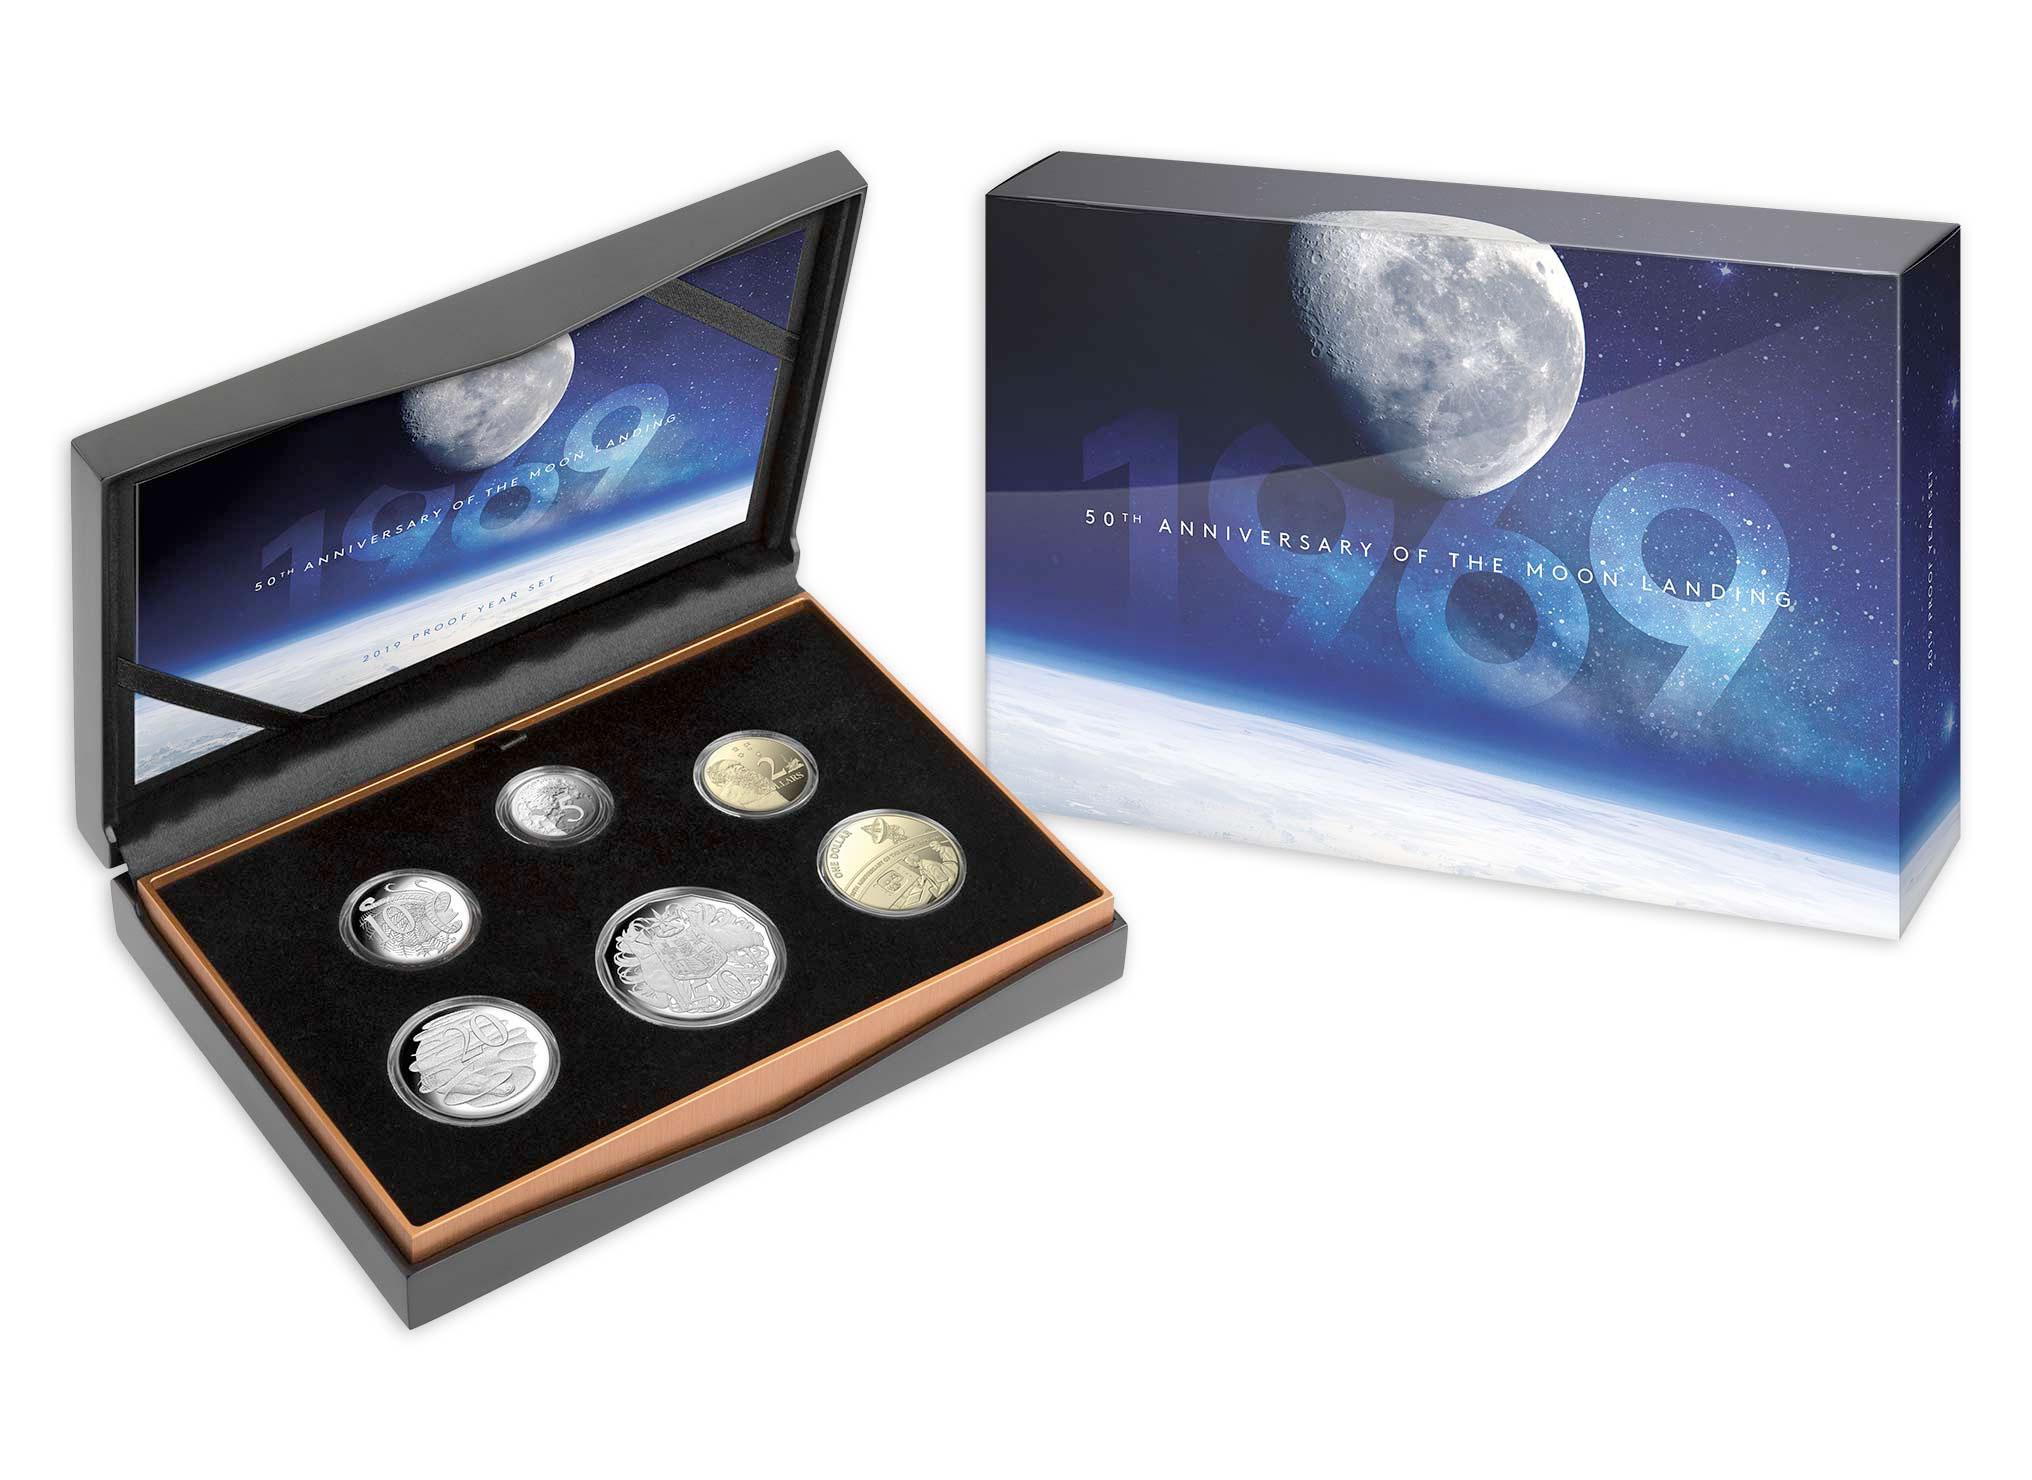 Sydney ANDA Coin Show 2009 Royal Australian Mint Astronomy Six Coin Mint Set